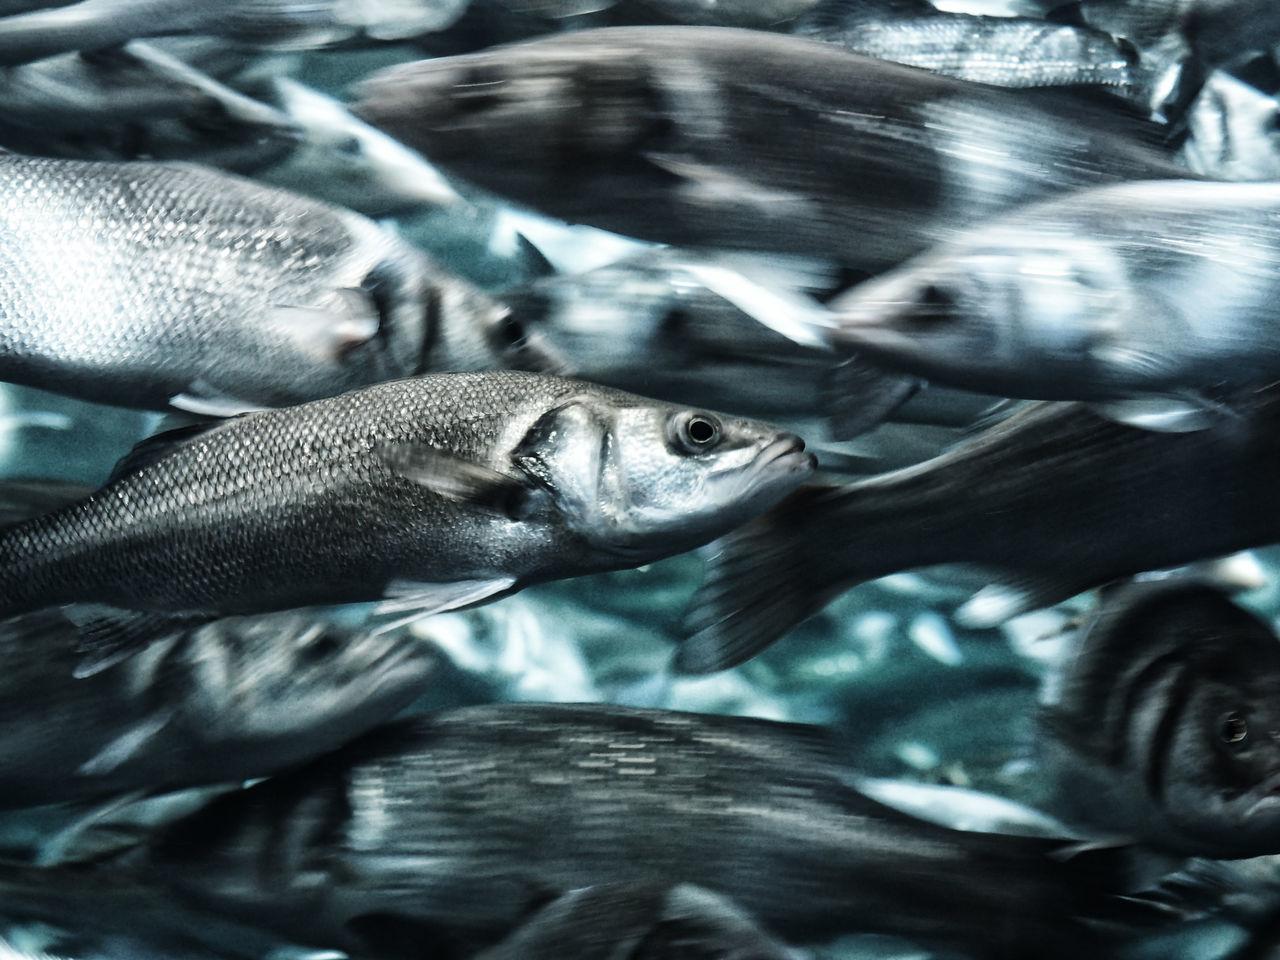 Animal Themes Aquarium Close-up Day Fish Fishs Freshness LoroParque No People Outdoors Teneriffa